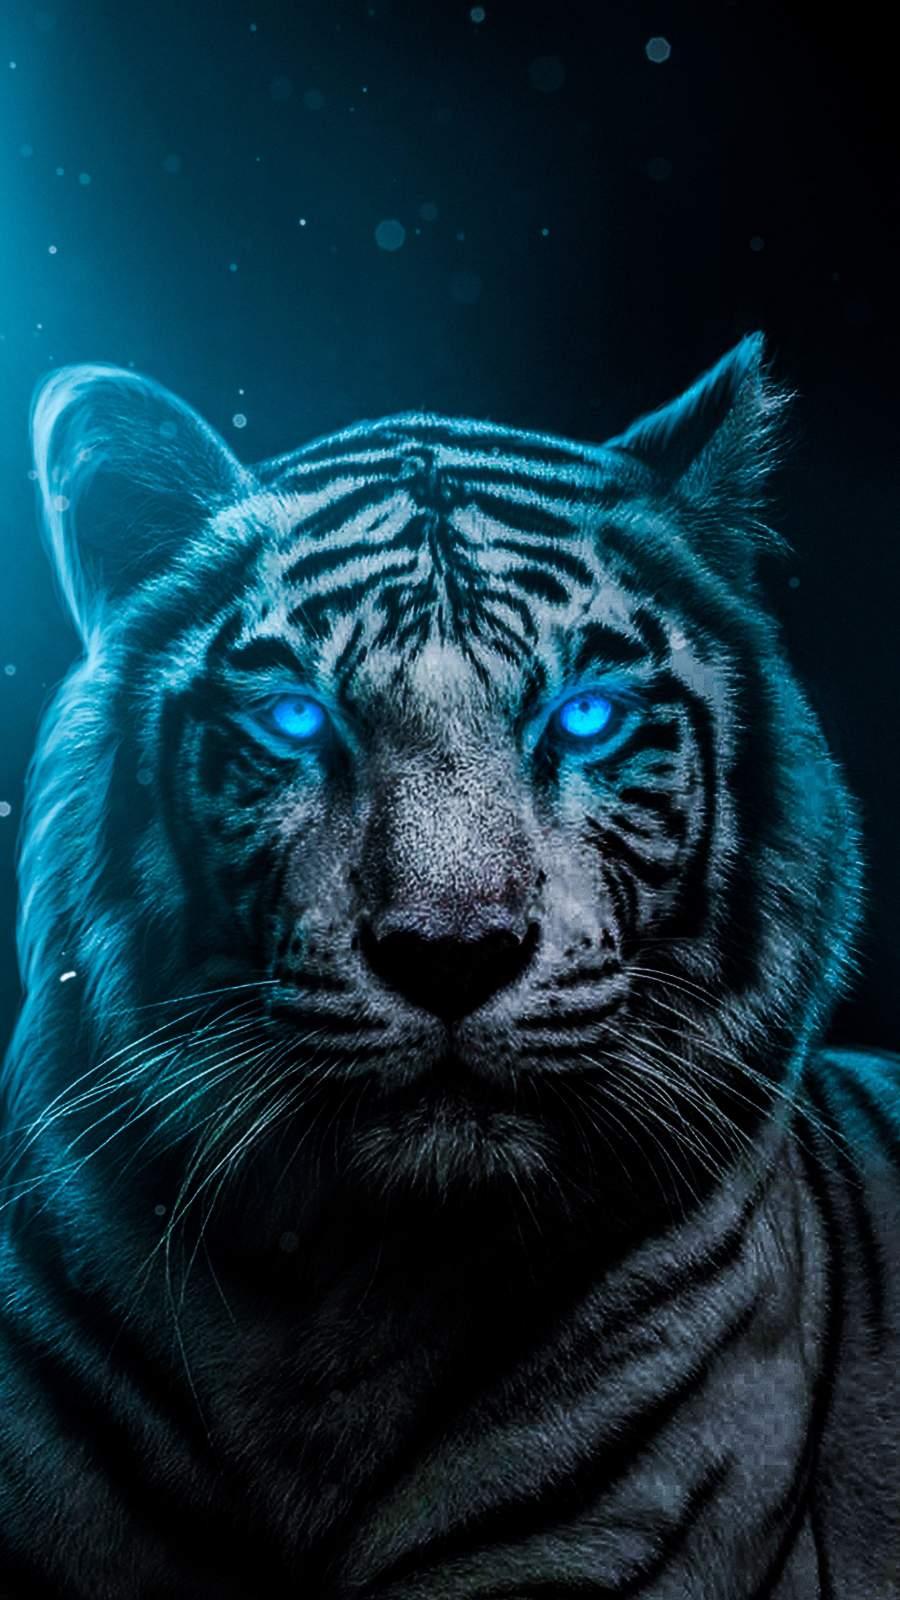 Blue Eyes Lion iPhone Wallpaper